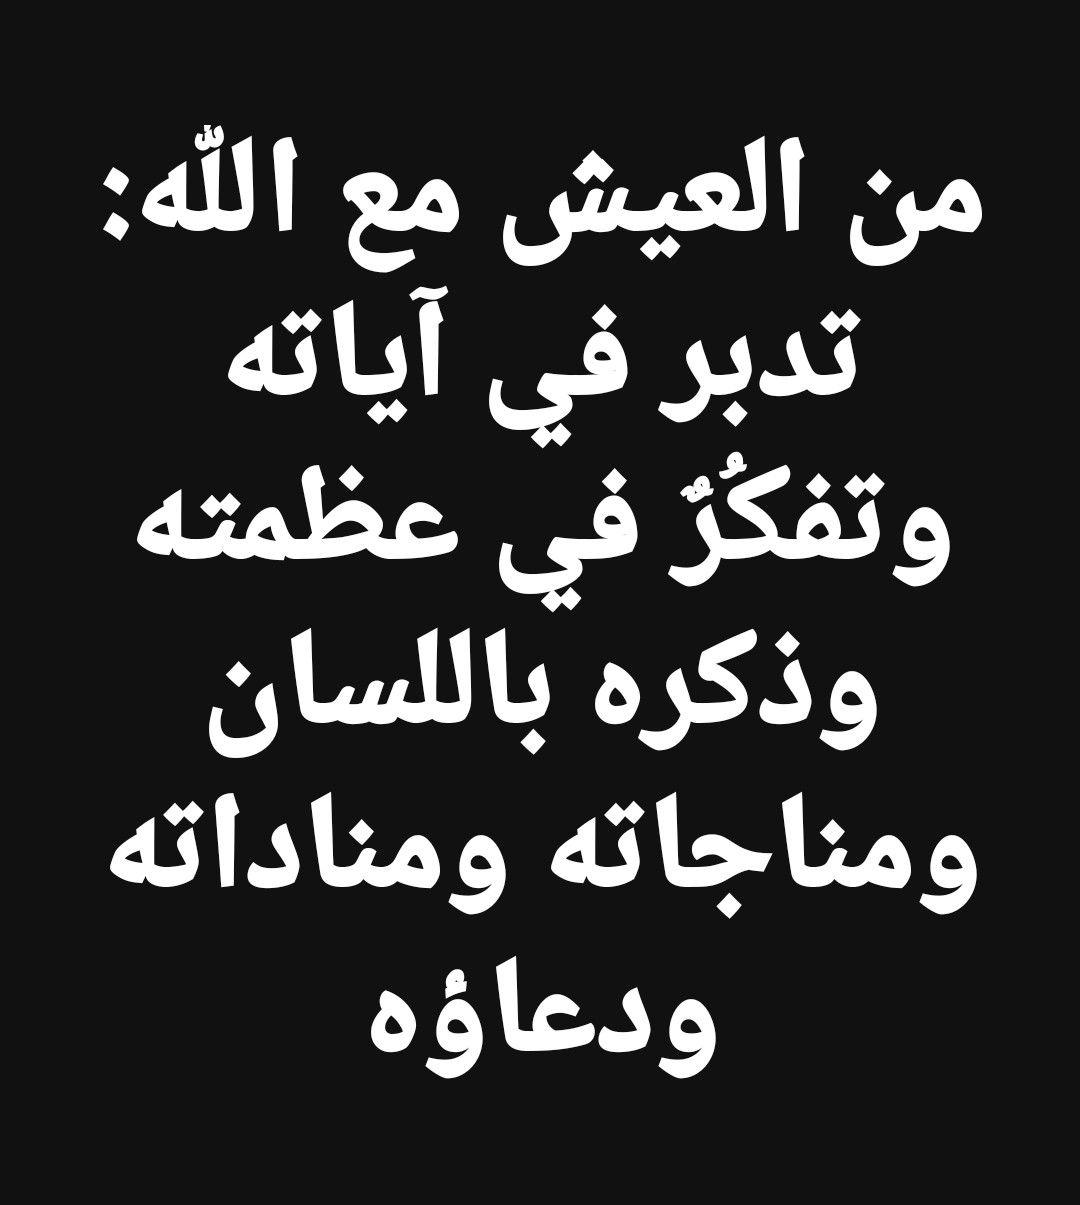 Pin By Jassim Aal On اللهم إنا نعوذ بك من الهم والكسل والحزن ومن العجز والألم صباحكم فرح Arabic Calligraphy Calligraphy Arabic